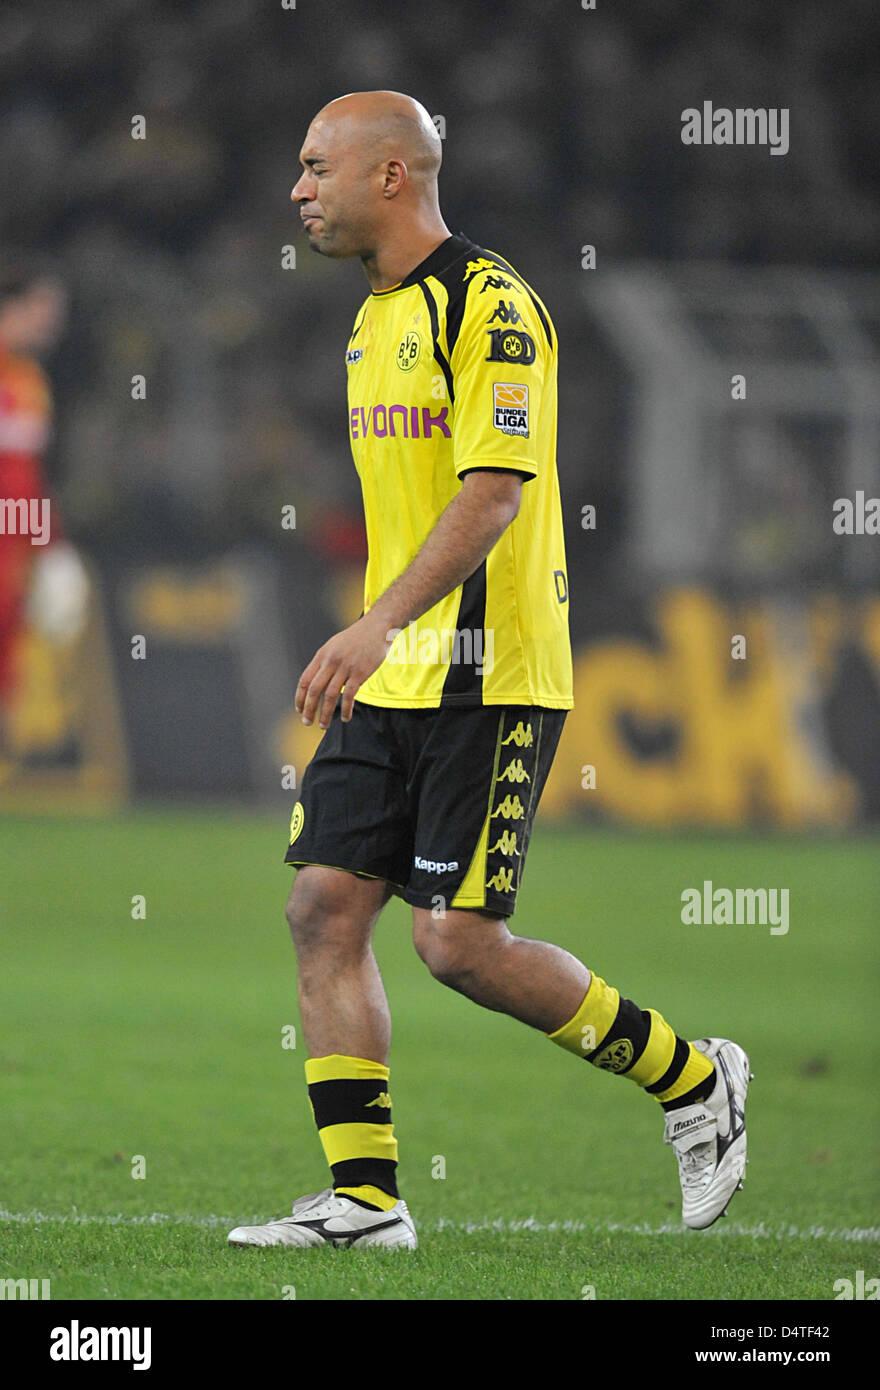 Dortmund?s Dede leaves the field after harming himself in a duel during the German Bundesliga match Borussia Dortmund - Stock Image